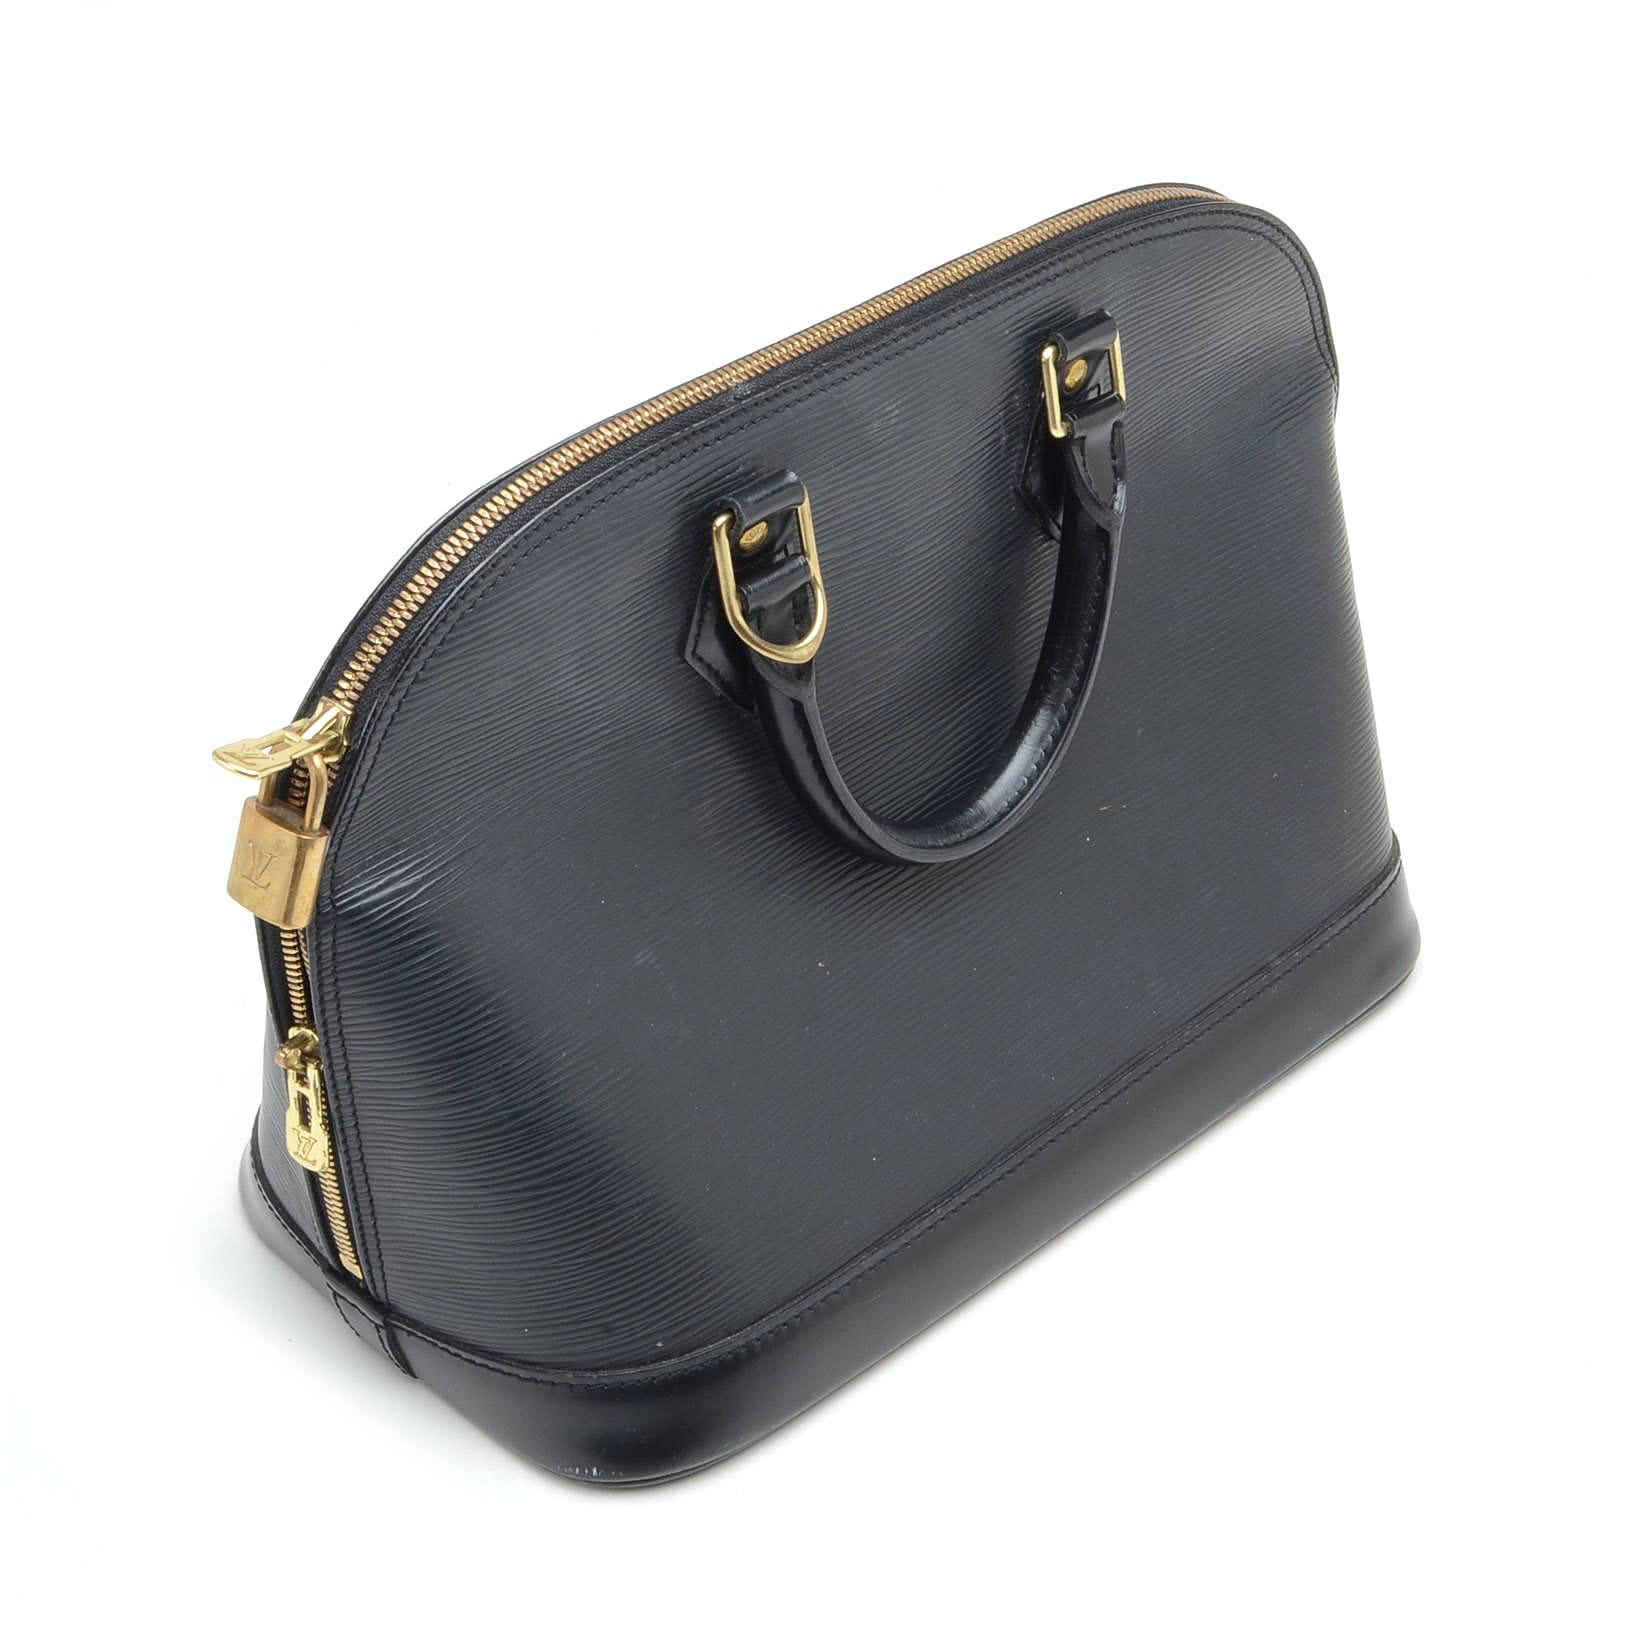 2001 Louis Vuitton Alma Black Epi Leather Handbag